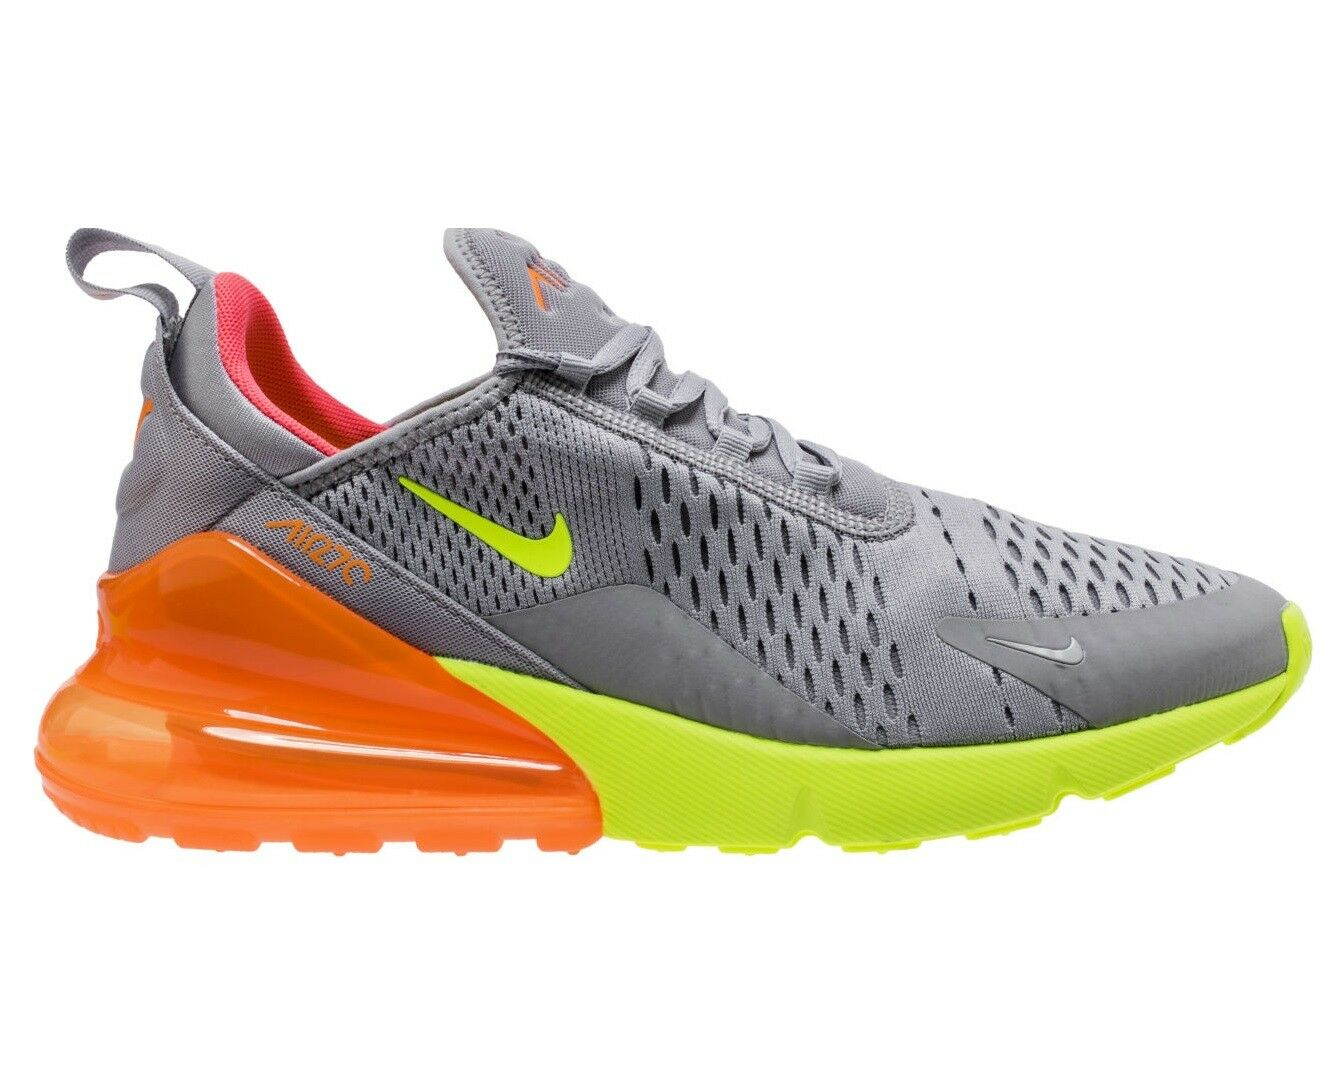 Nike Air Max 270 Mens AH8050-012 Grey Volt Orange Mesh Running Shoes Size 13